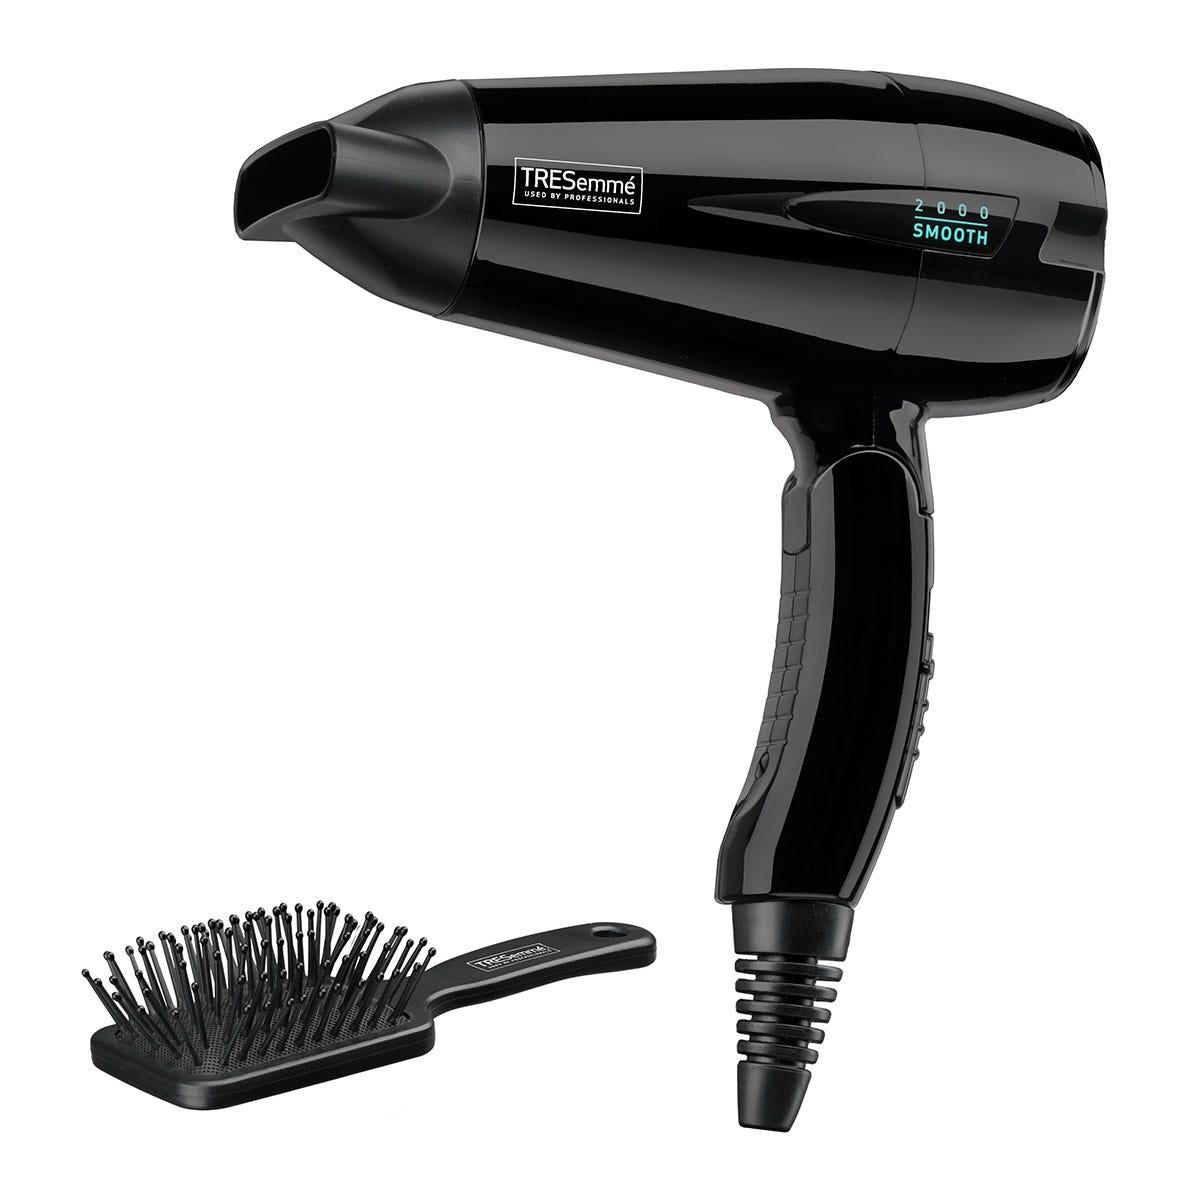 TRESemme BAB5549U Salon Professional Travel 2000 Hairdryer - Black